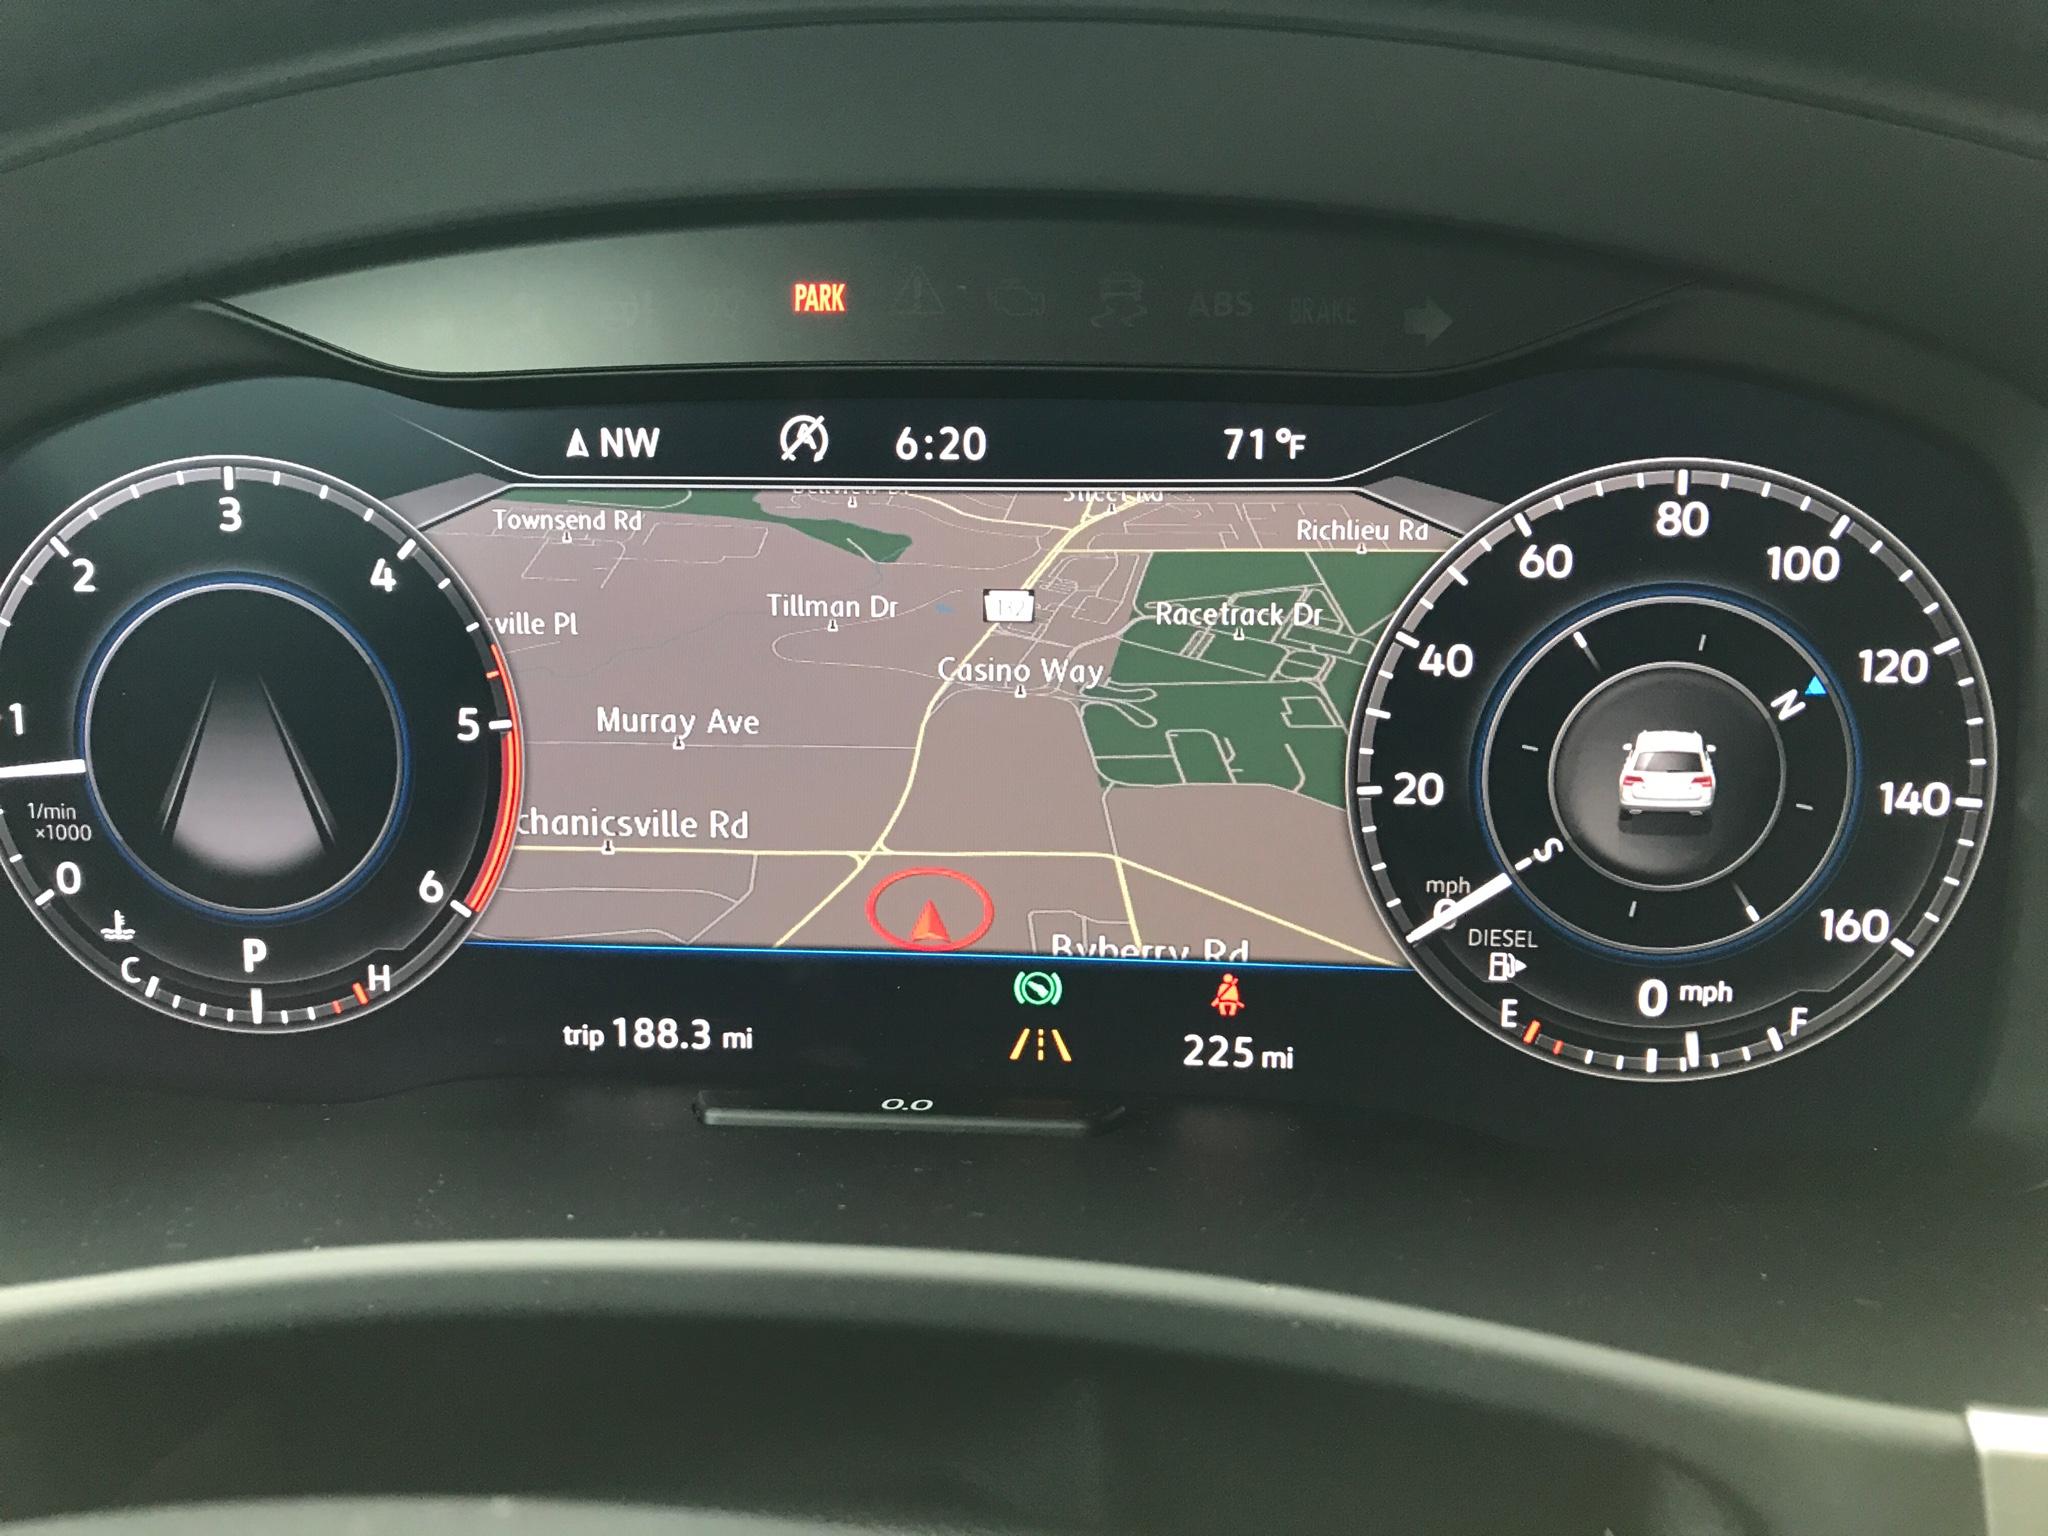 vwvortexcom  problem  digital cockpit